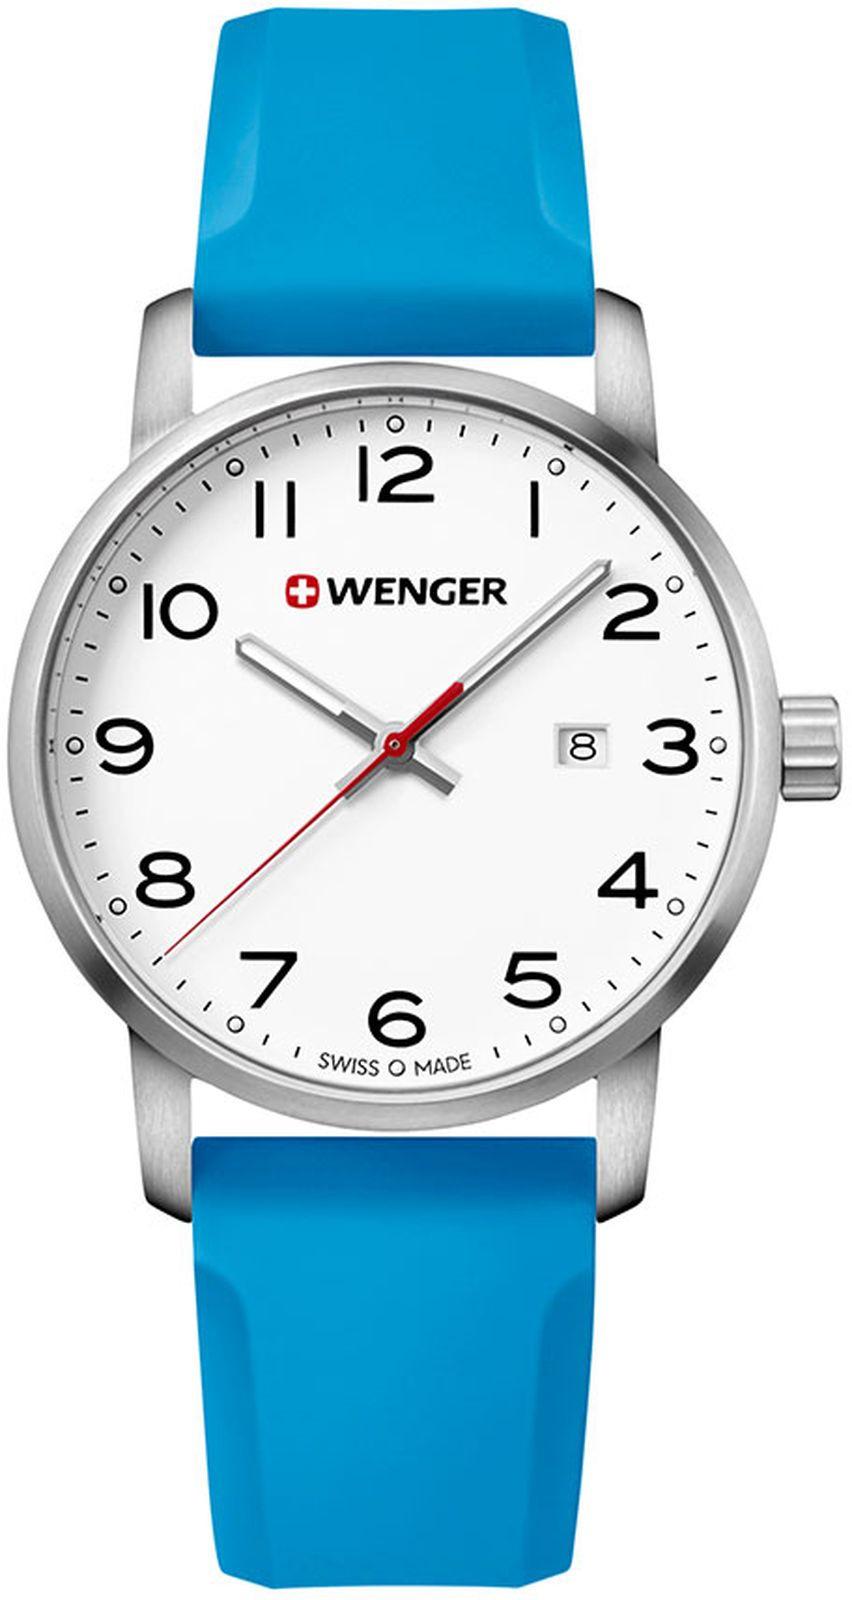 цена Наручные часы Wenger мужские, голубой онлайн в 2017 году